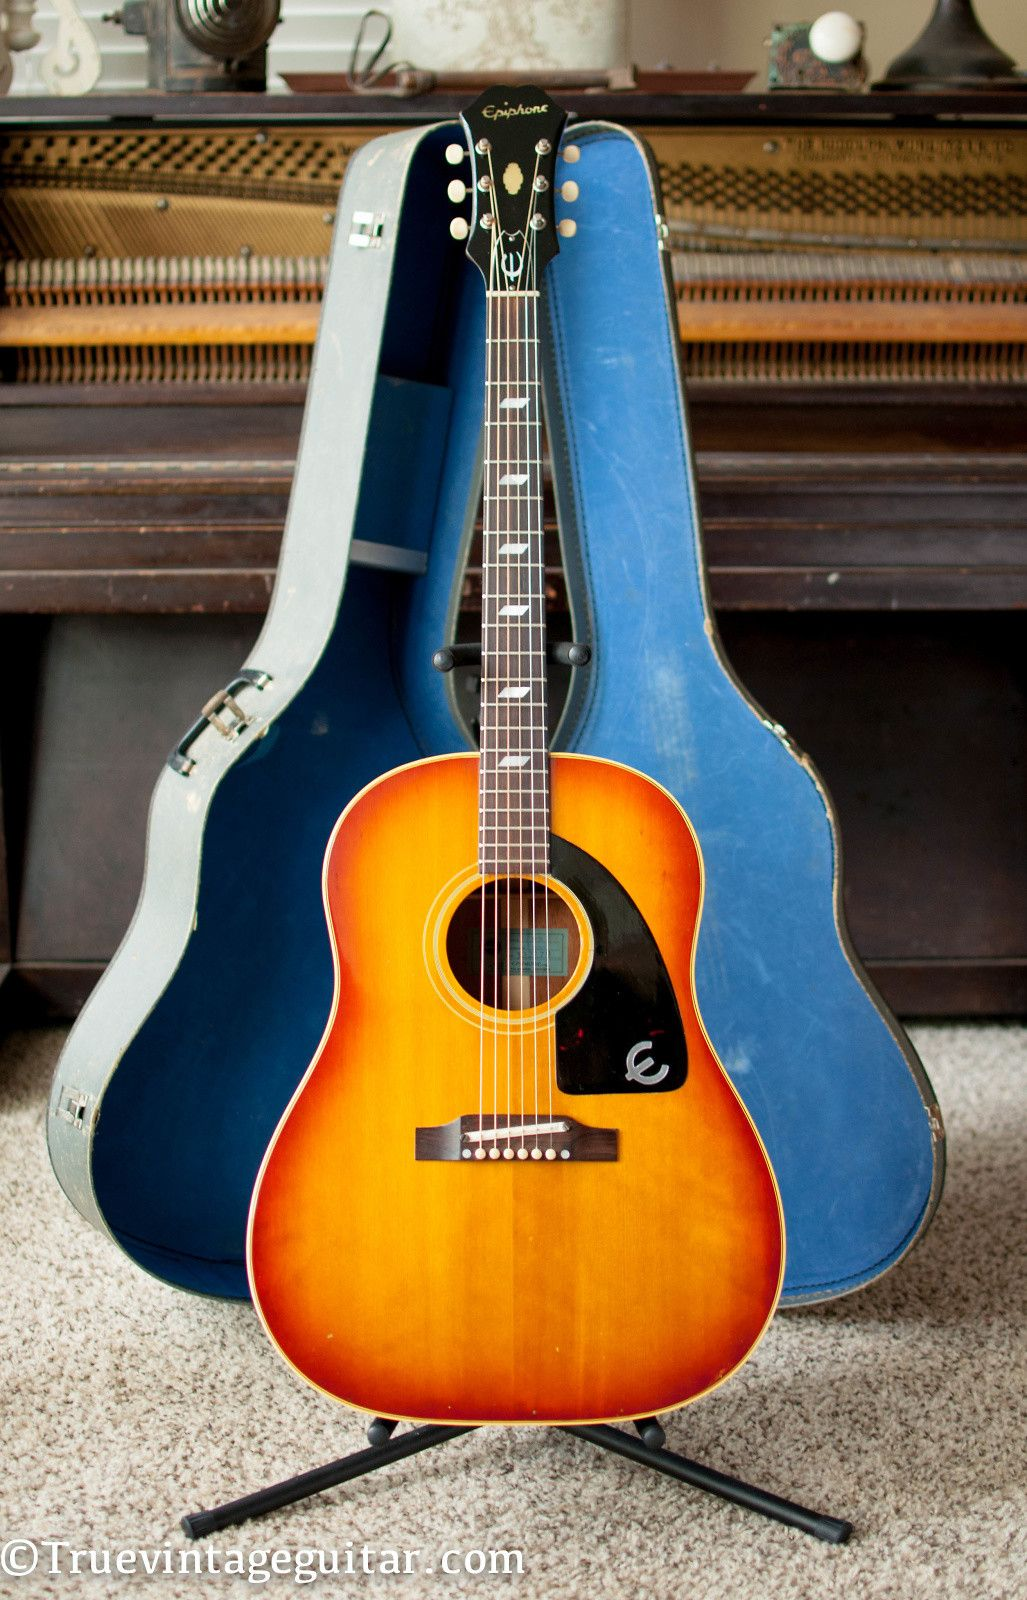 Epiphone Texan Ft 79 Acoustic Guitar Reverb Epiphone Epiphone Guitars Guitar